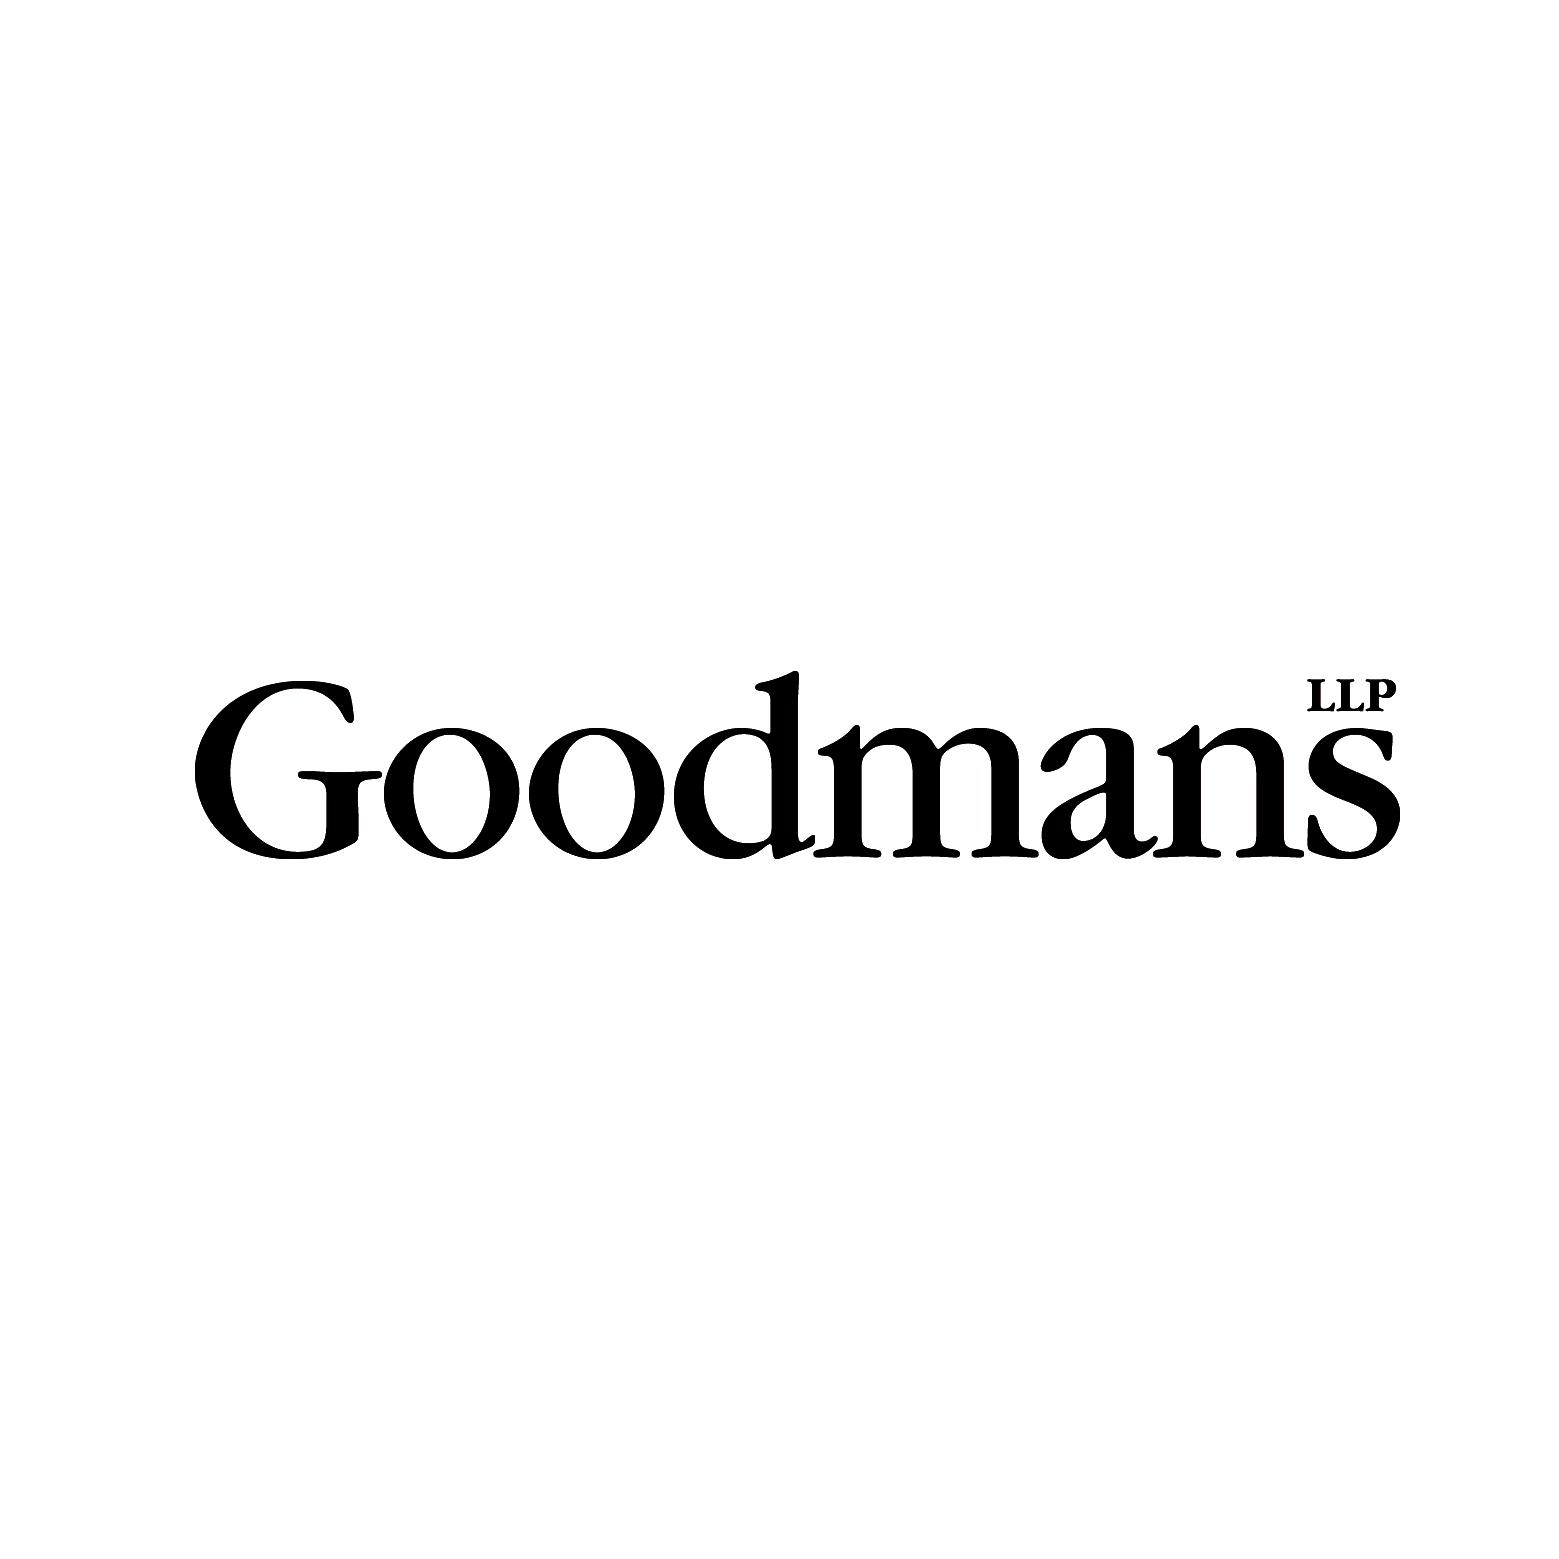 GoodmansLogoLargeColour.jpg